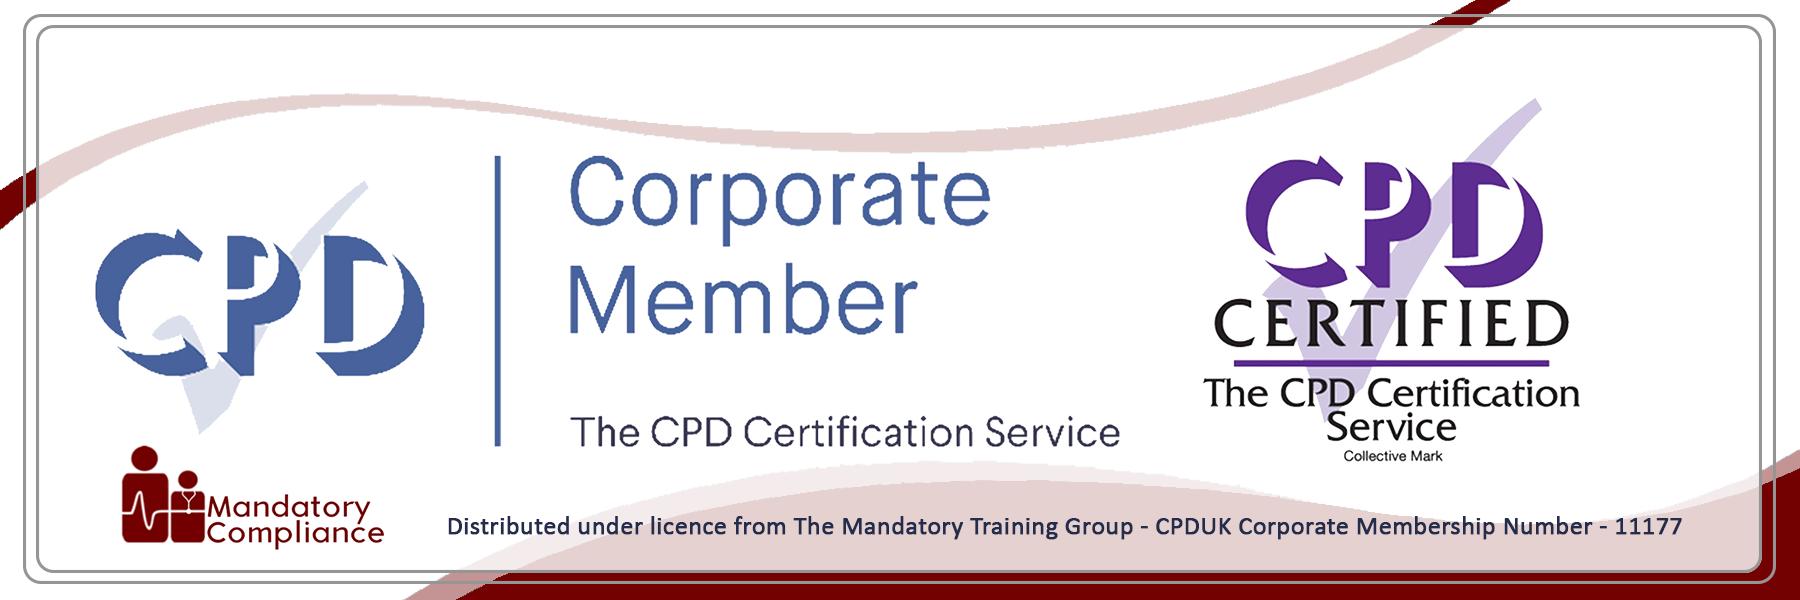 Immunisation and Vaccination - Online Training Courses - Mandatory Compliance UK-